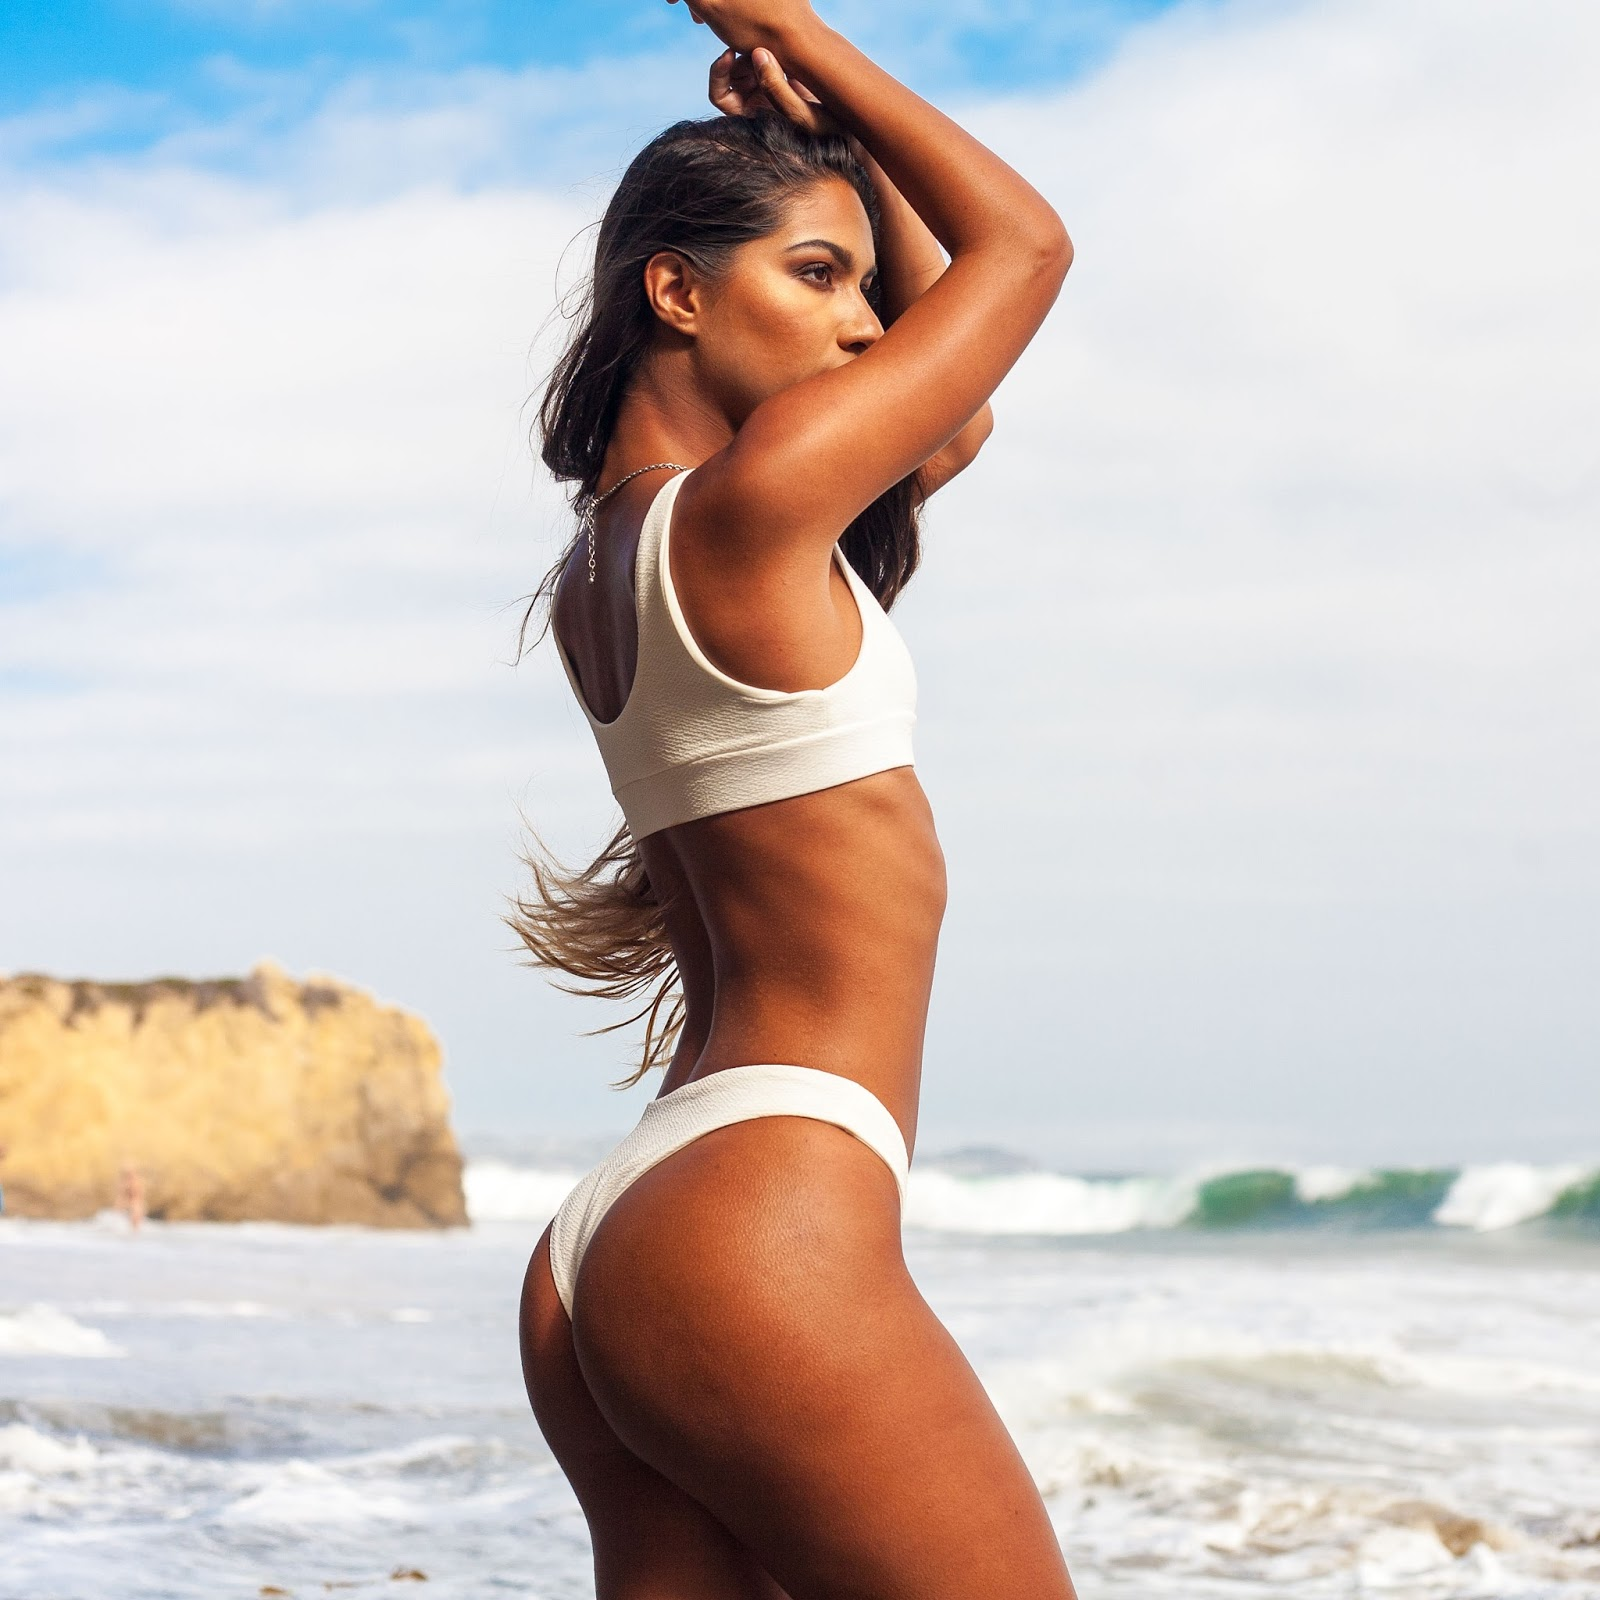 Instagram Erika Wheaton naked (31 photo), Pussy, Paparazzi, Instagram, in bikini 2018